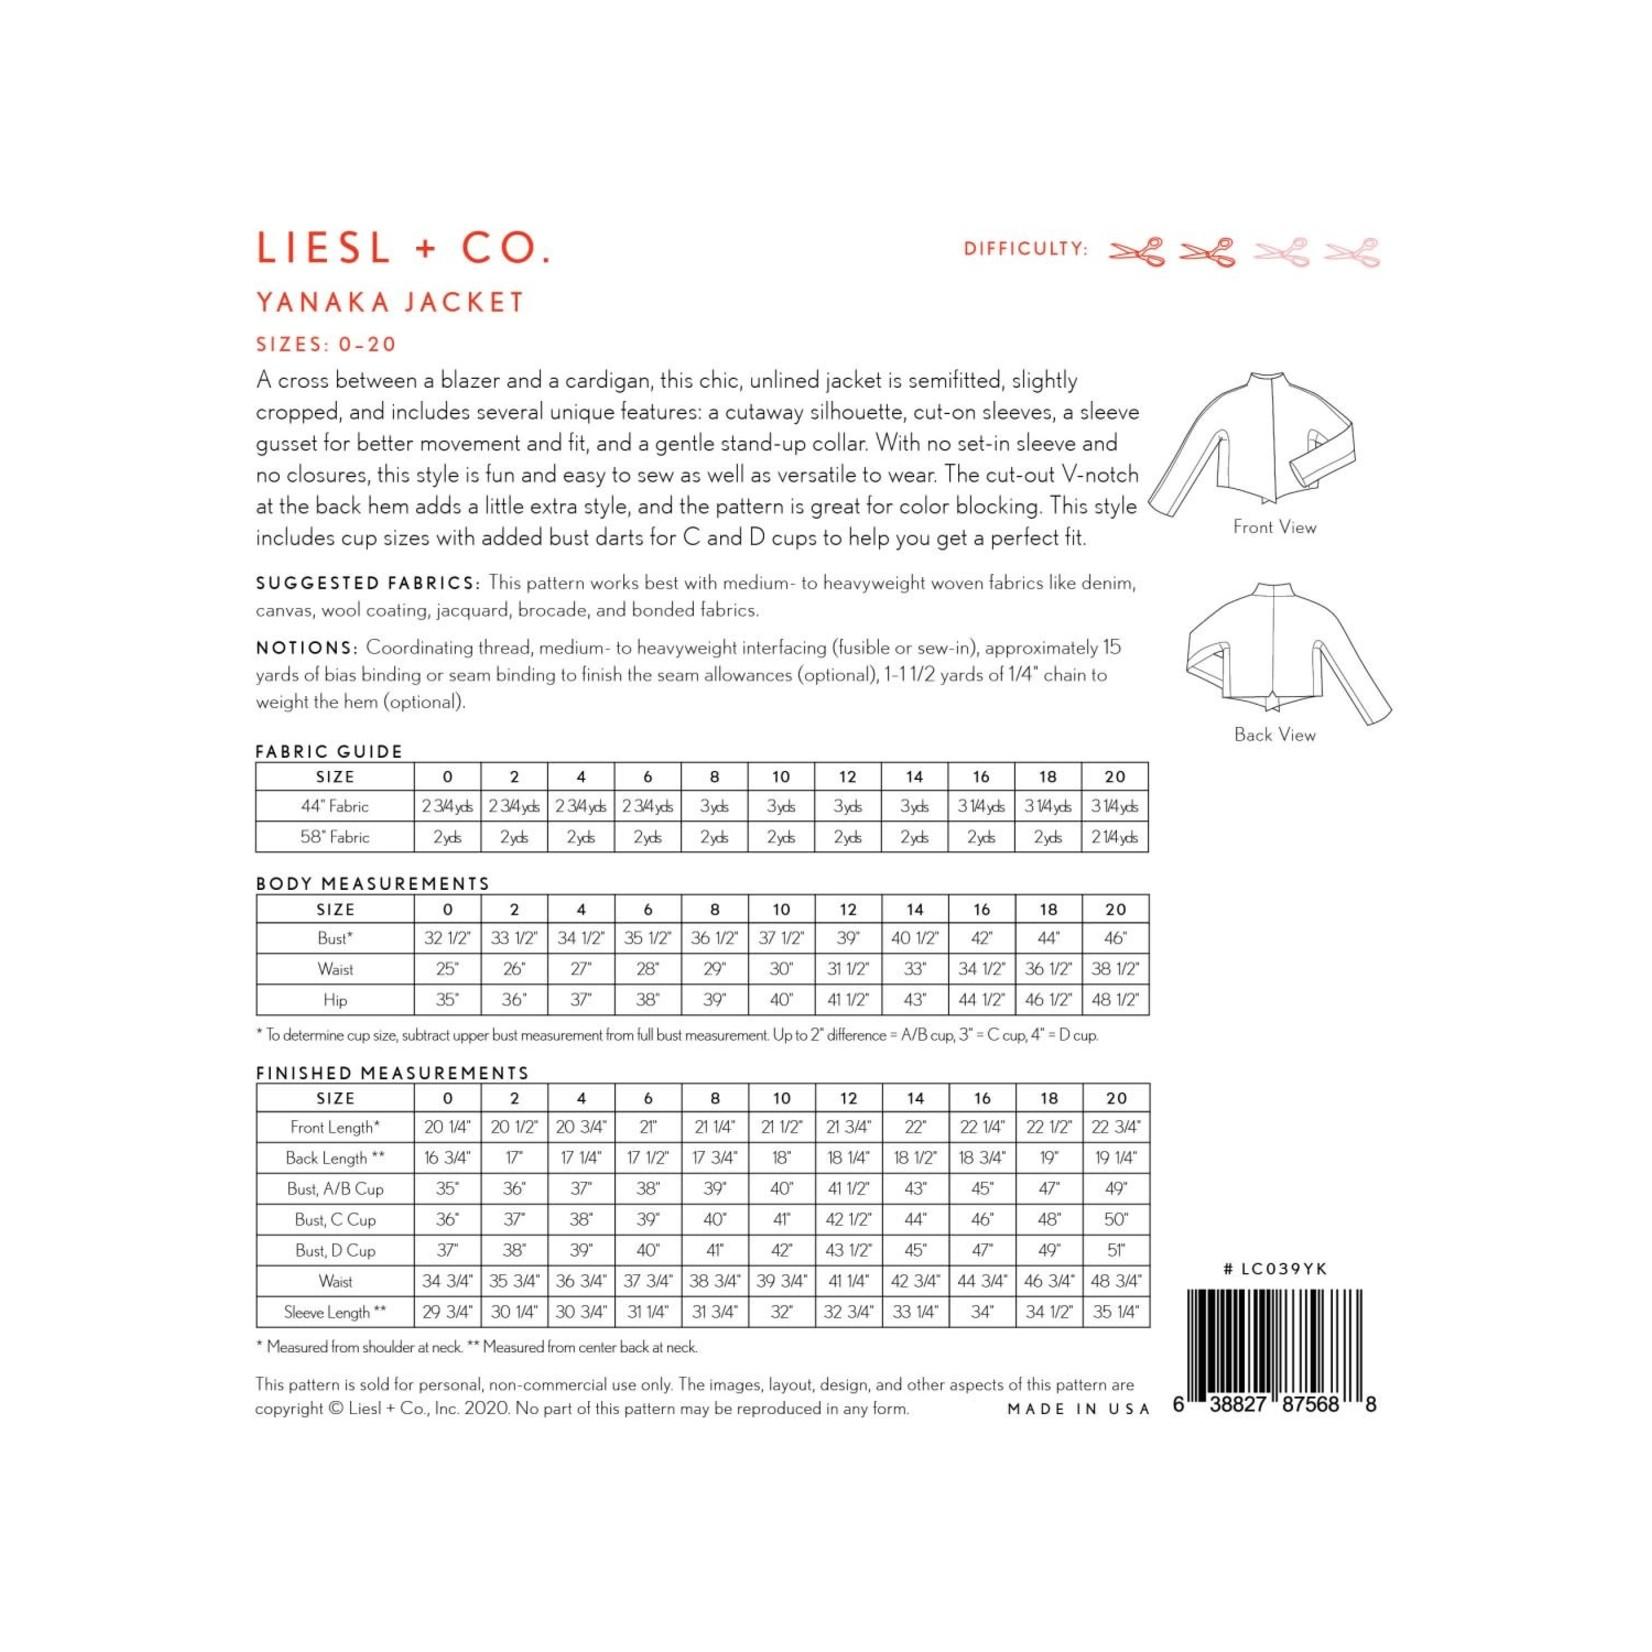 LIESL + CO Yanaka Jacket (Sizes 0-20)